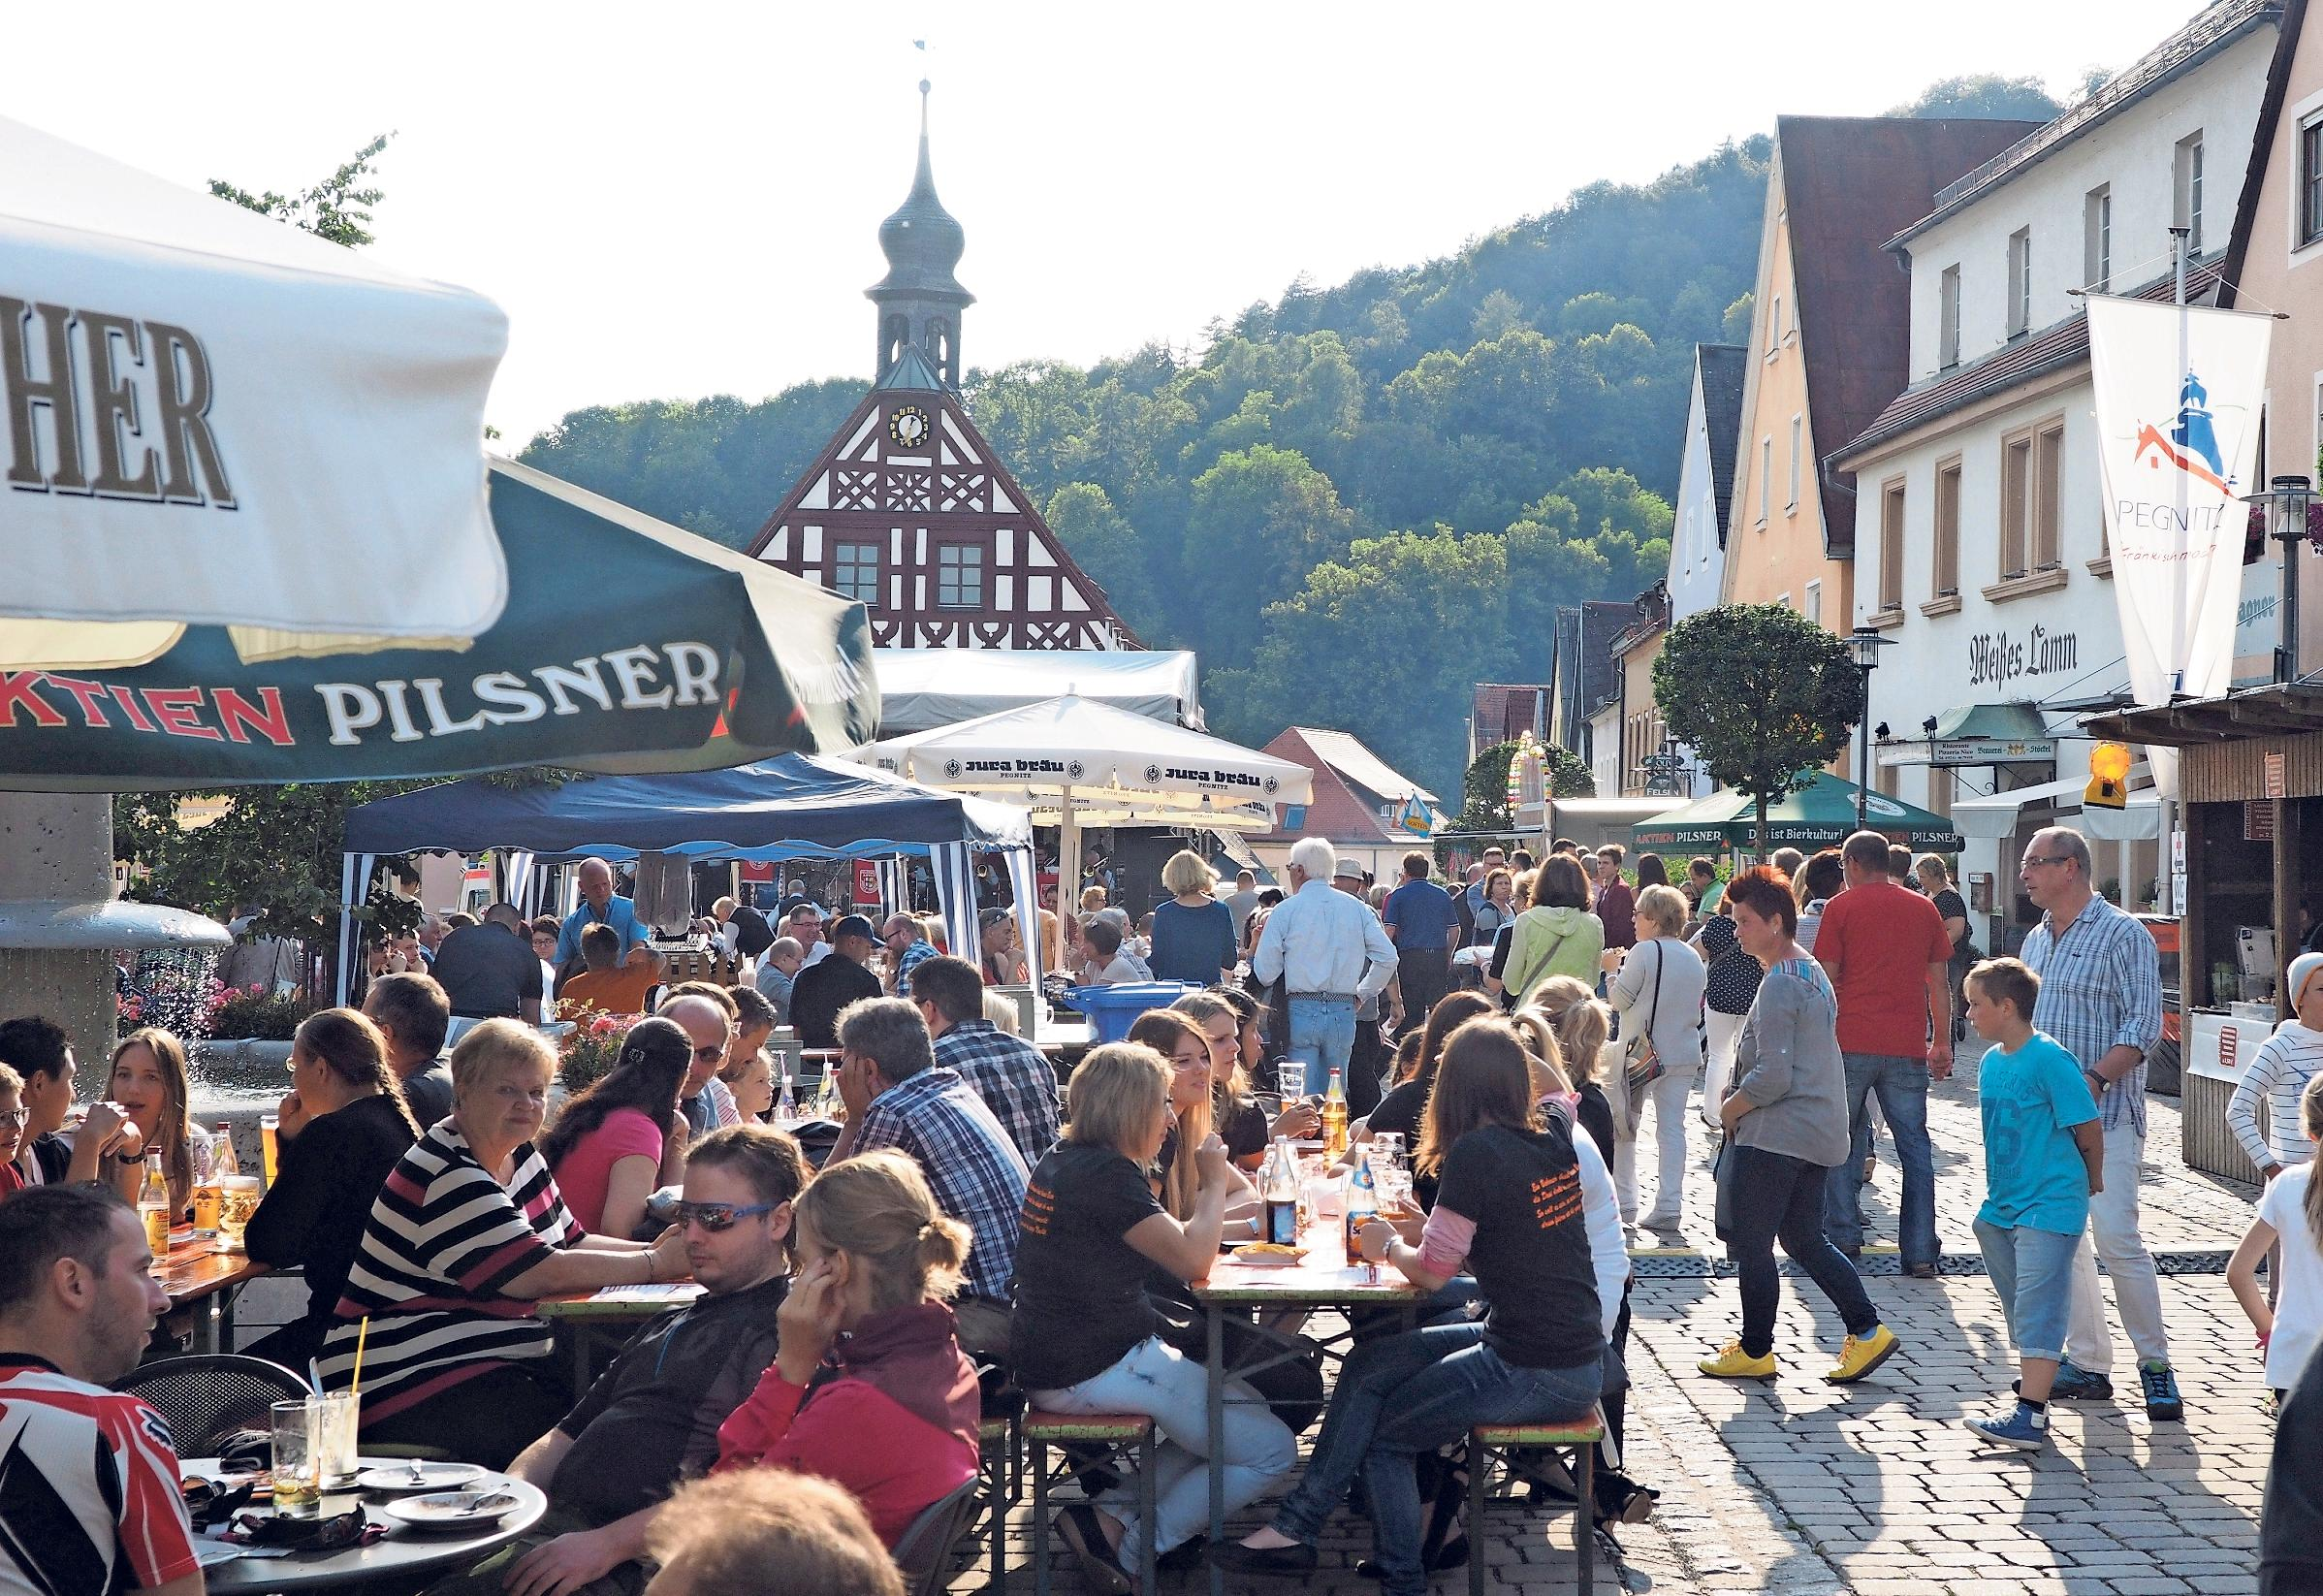 Drei Tage feiern: Marktplatzfest in Pegnitz Image 1